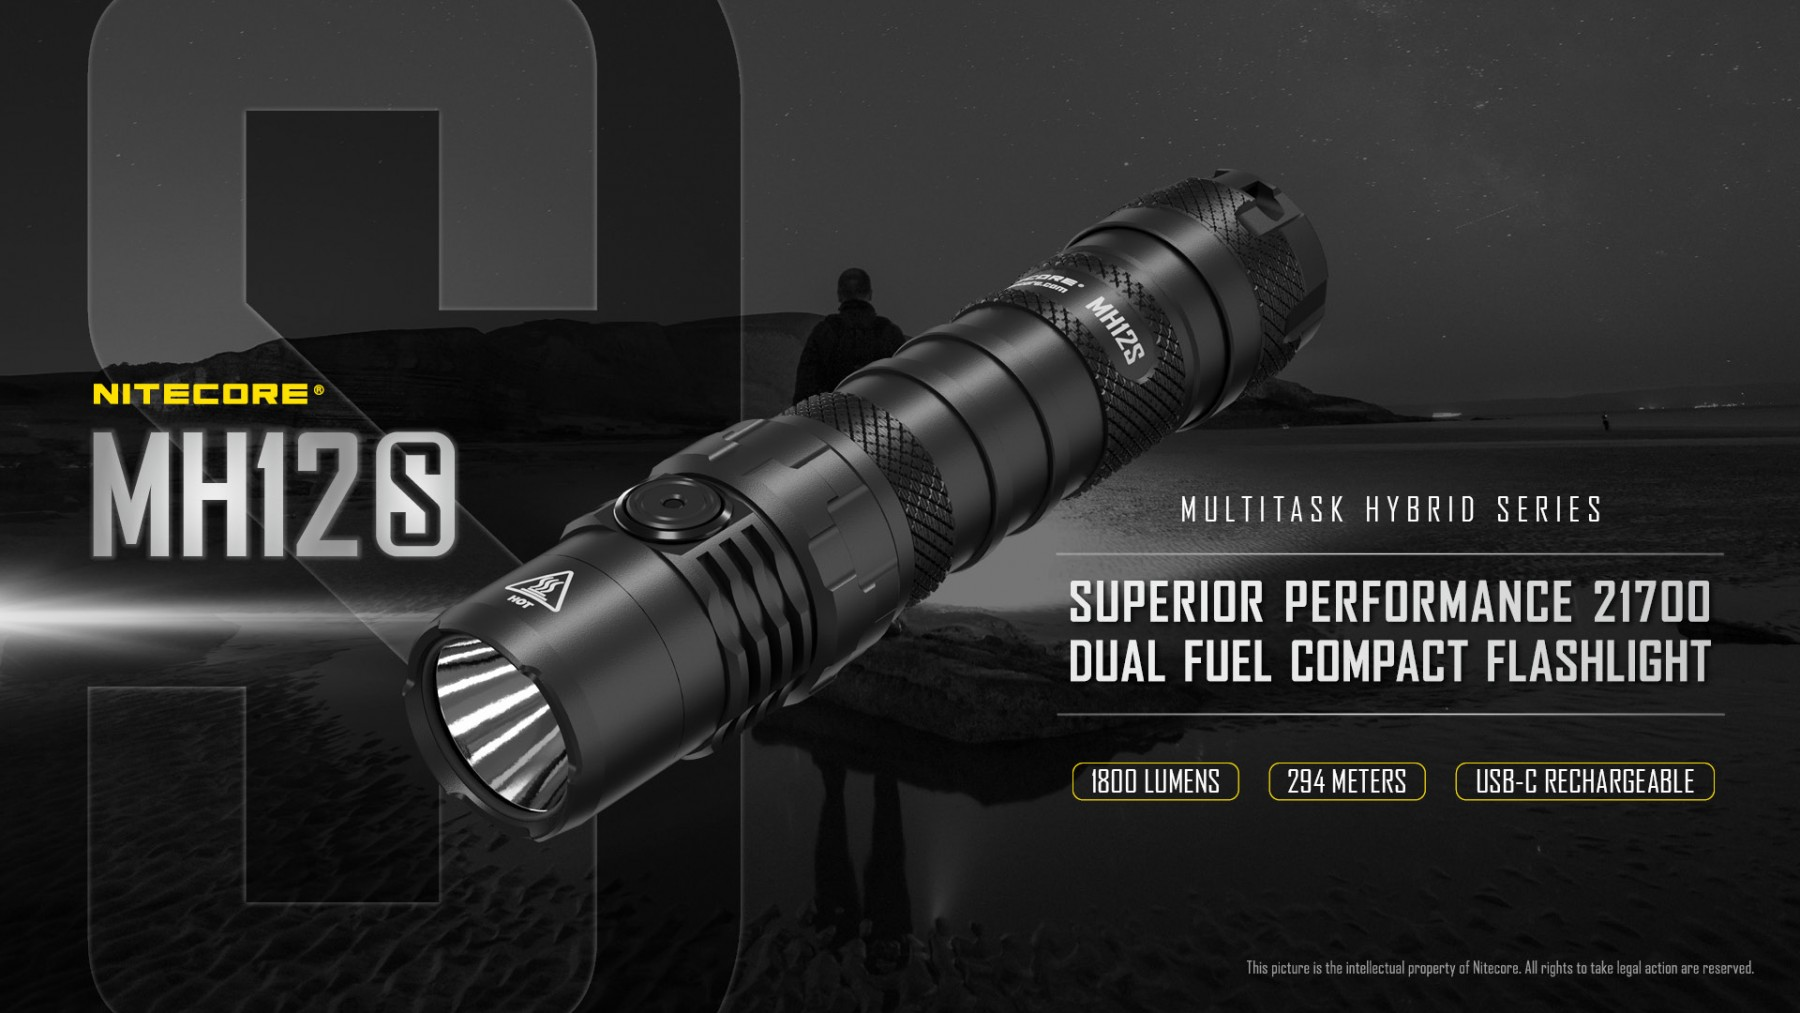 Nitecore - MH12S - Ricaricabile USB - 1800 lumens e 294 metri - Torcia Led